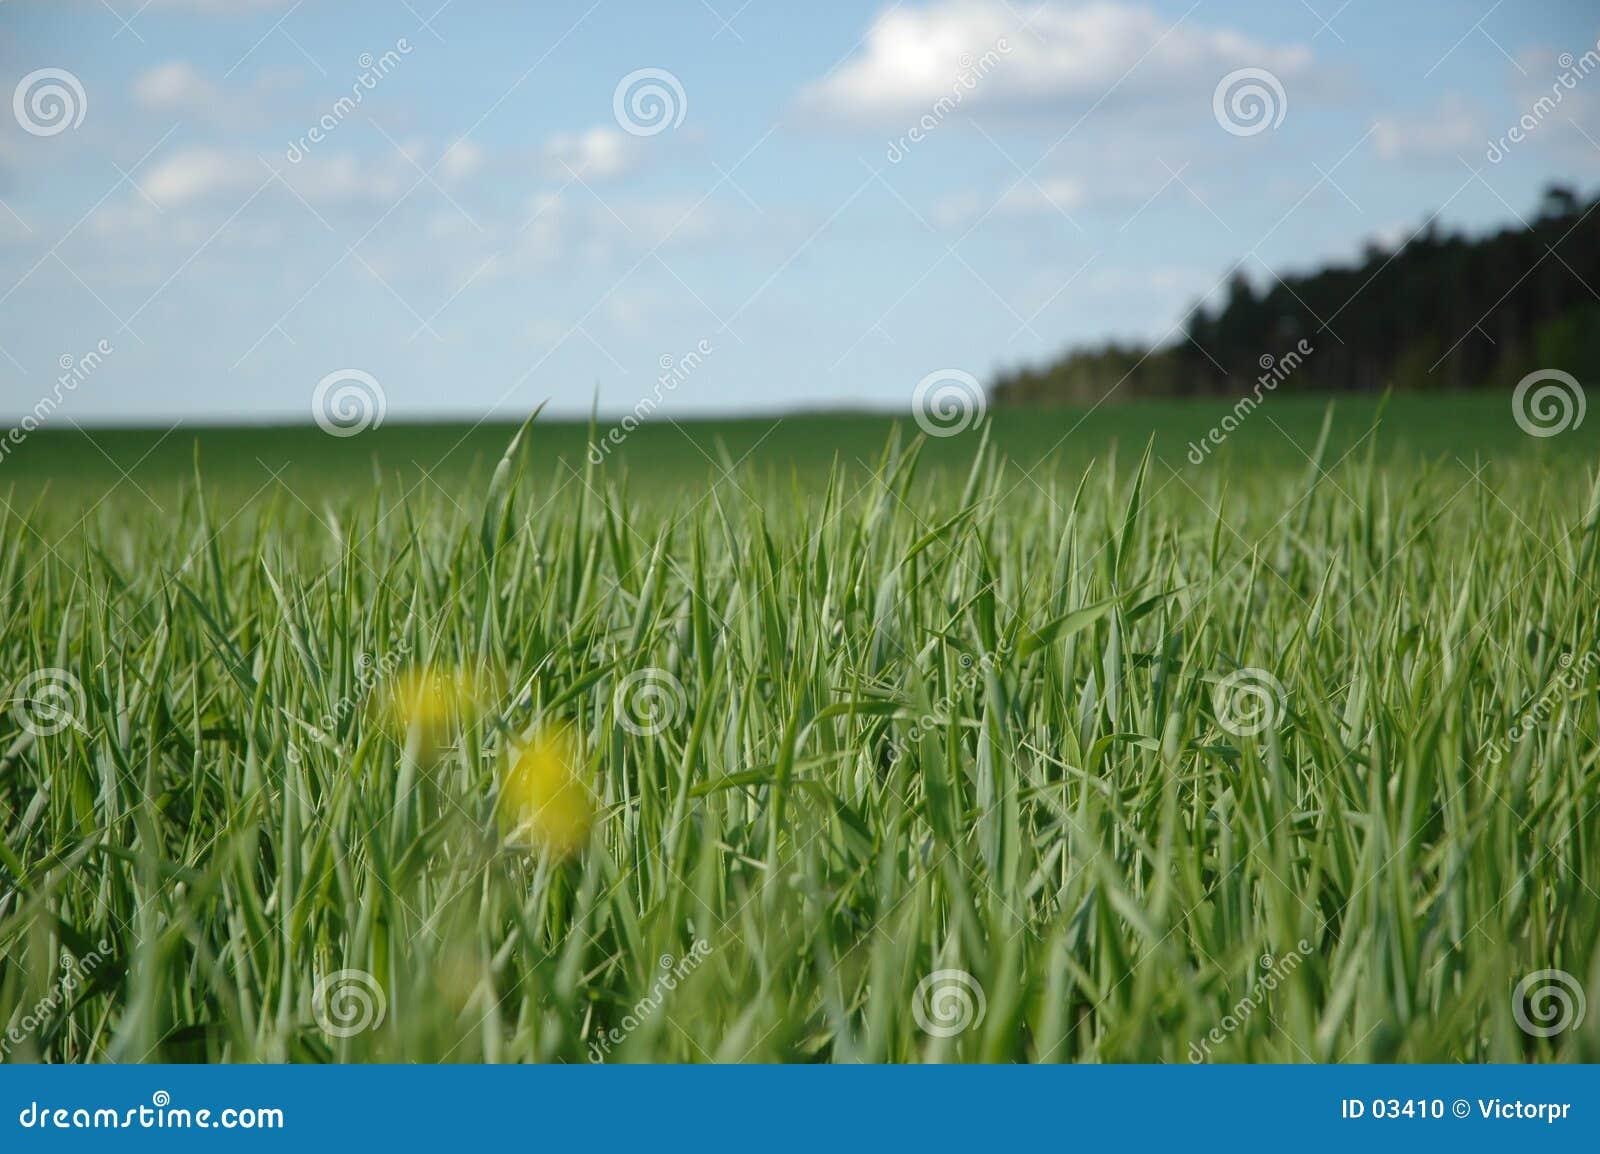 Grünes Feld, blauer Himmel